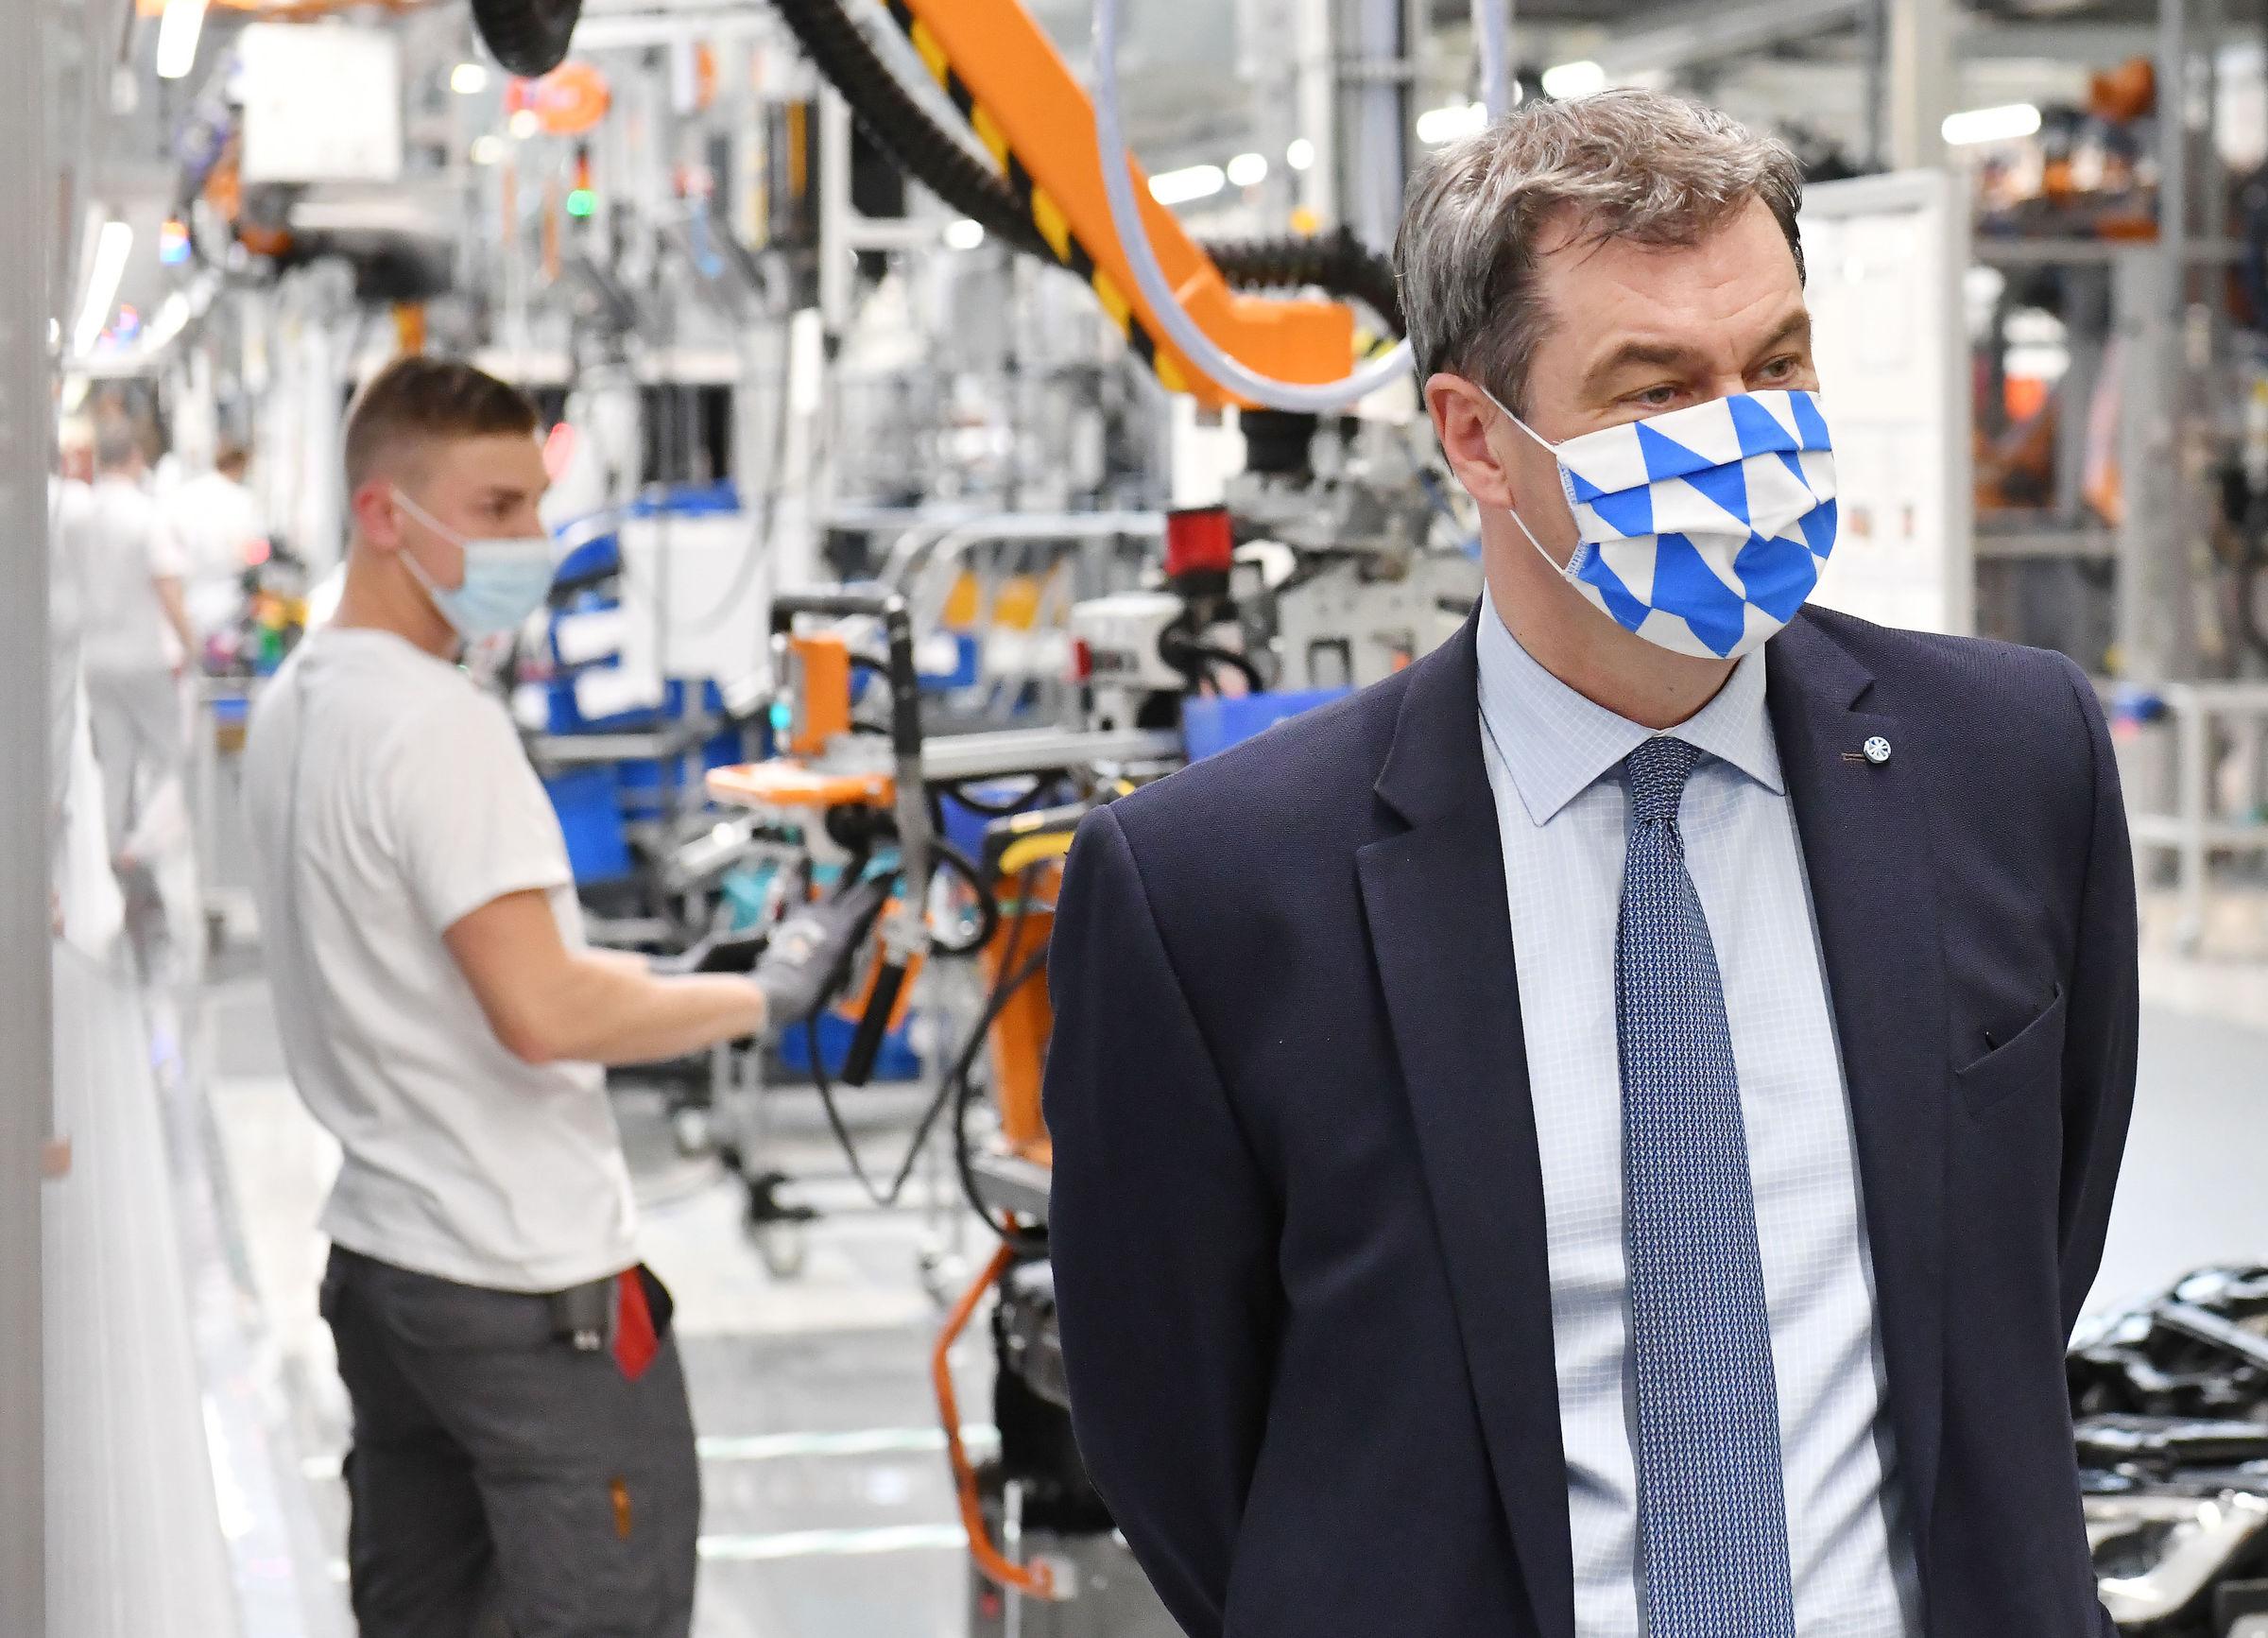 Markus Söder Visits Audi: Bavaria's Minister President Impressed with Protective Measures - Image 2